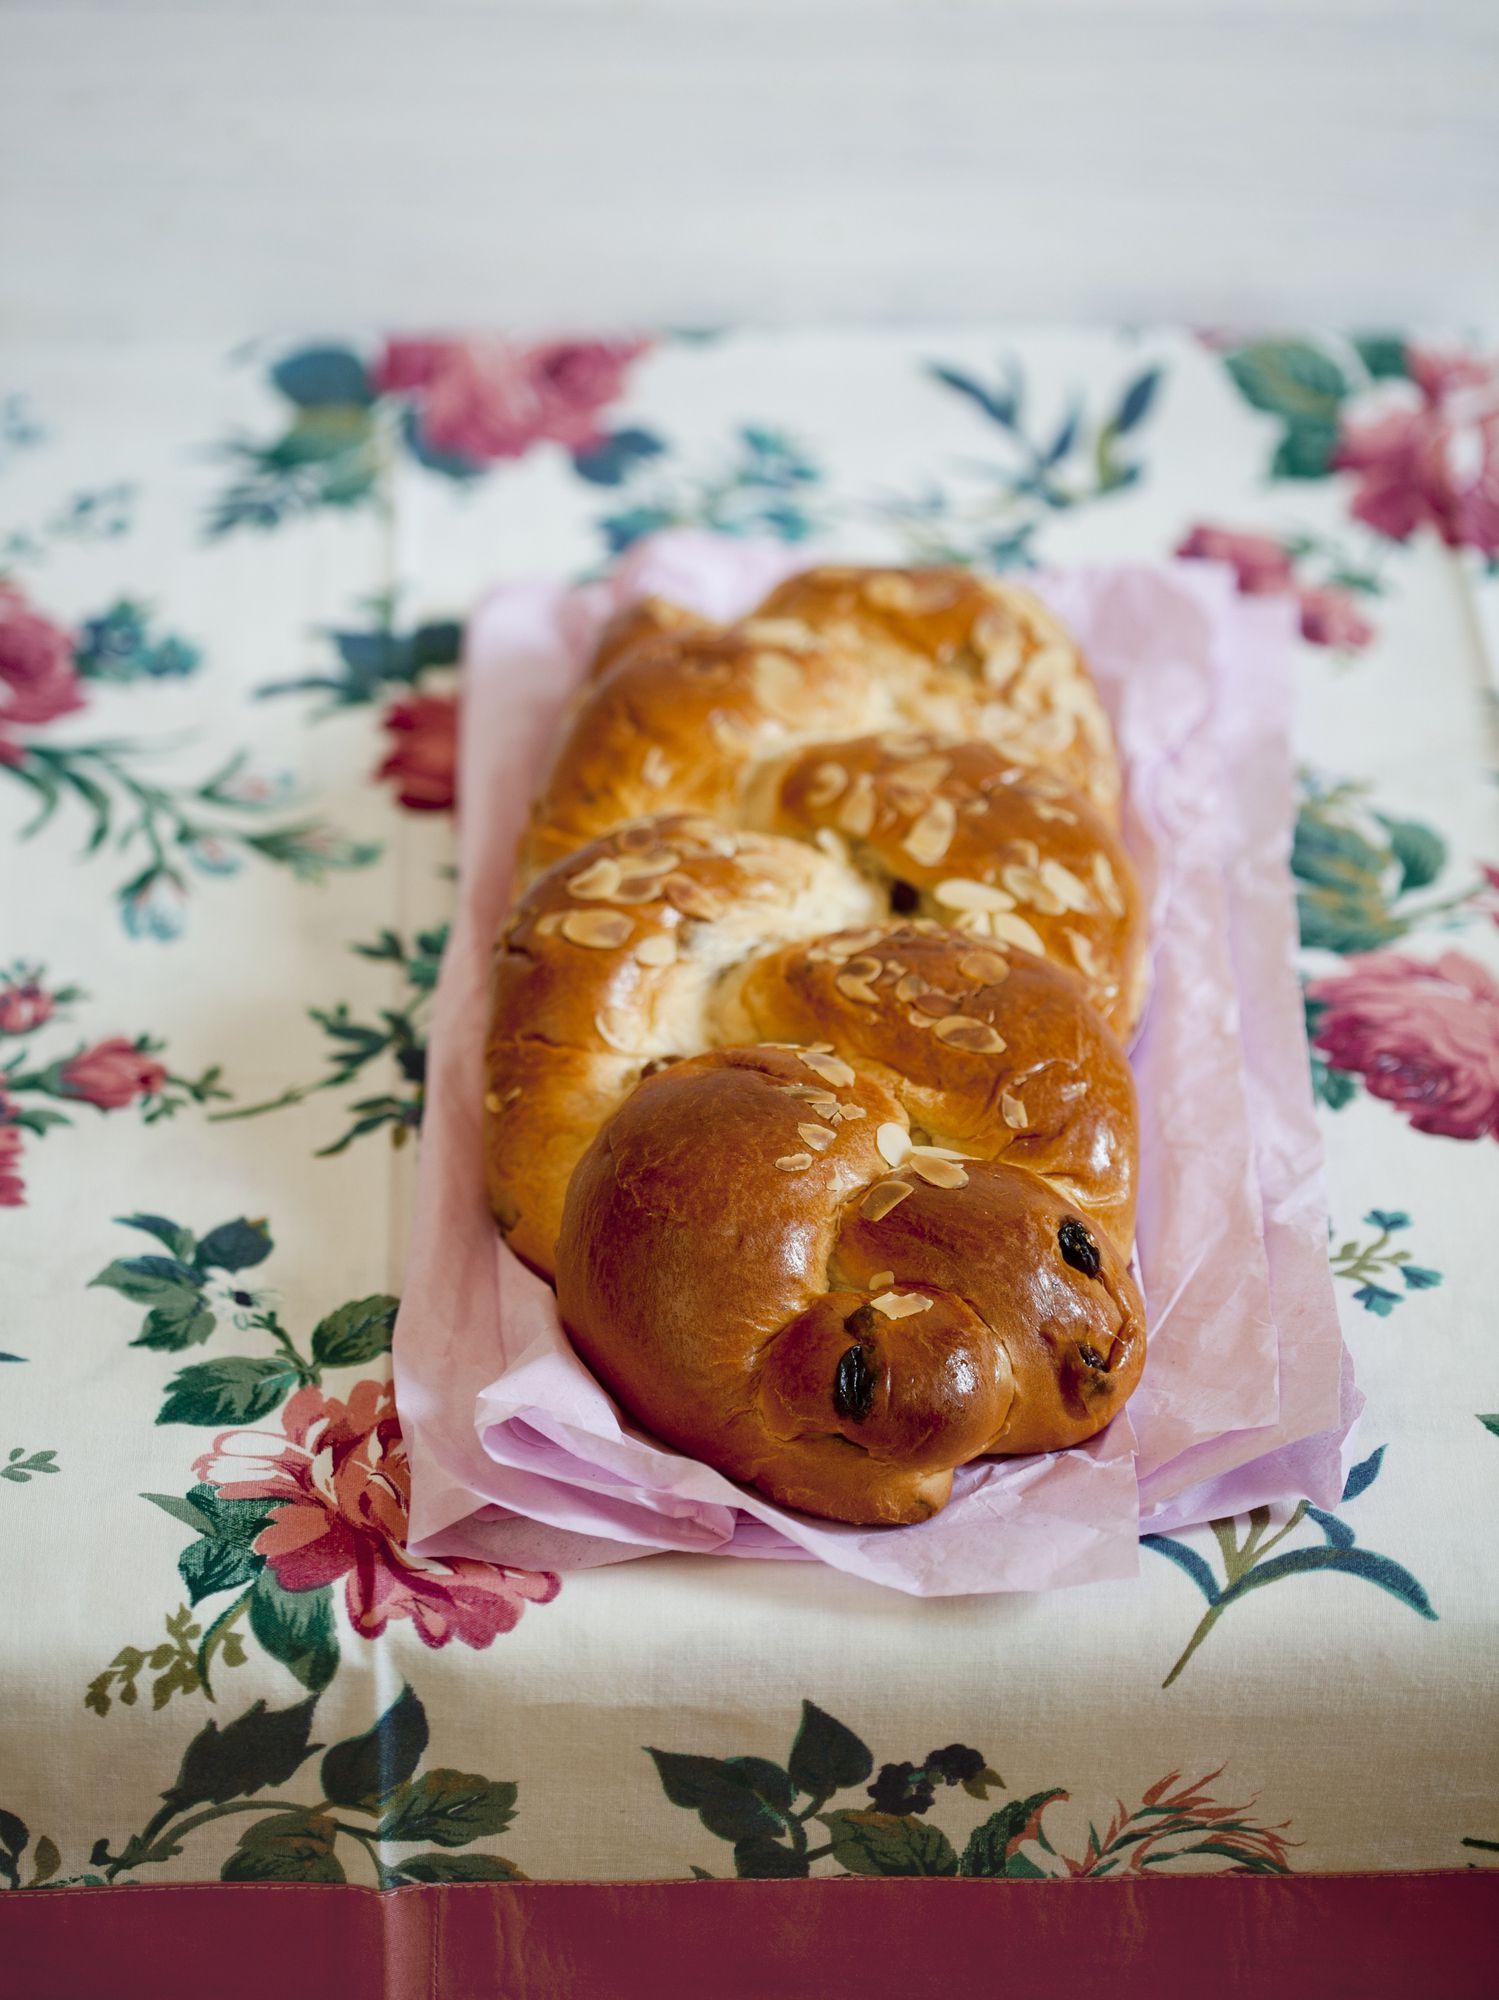 Czech Christmas Bread  Czech Braided Christmas Bread Vanocka Recipe